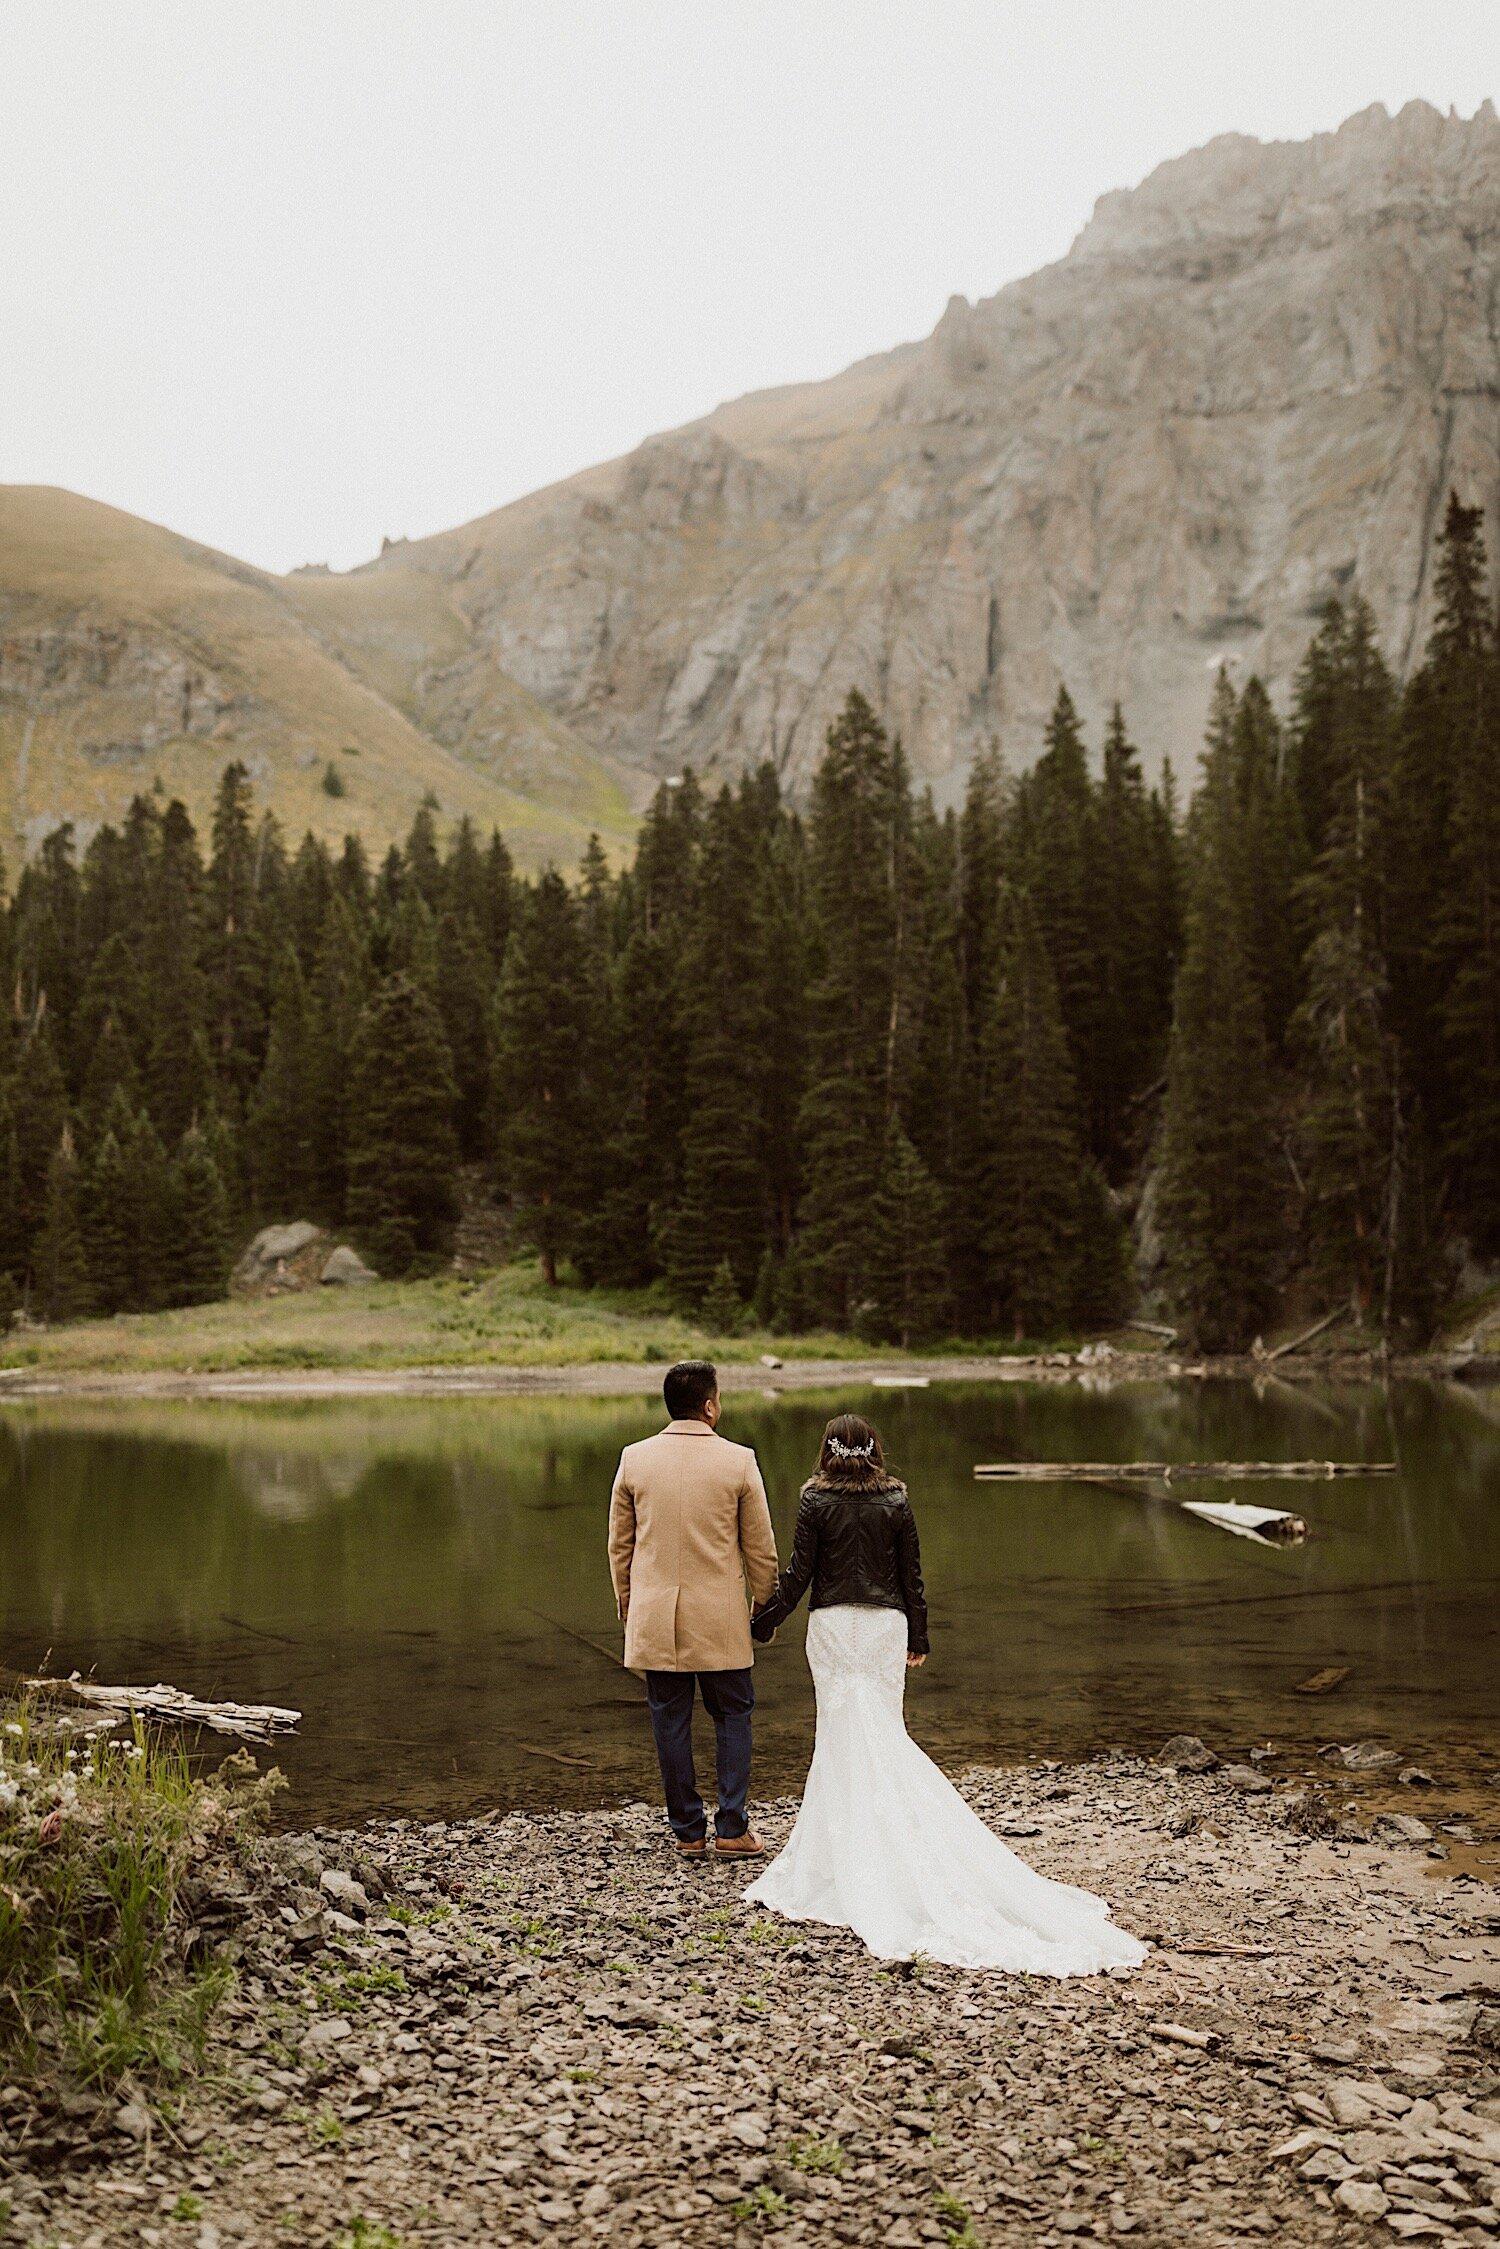 16_intimate-wedding-telluride-colorado-25.jpg